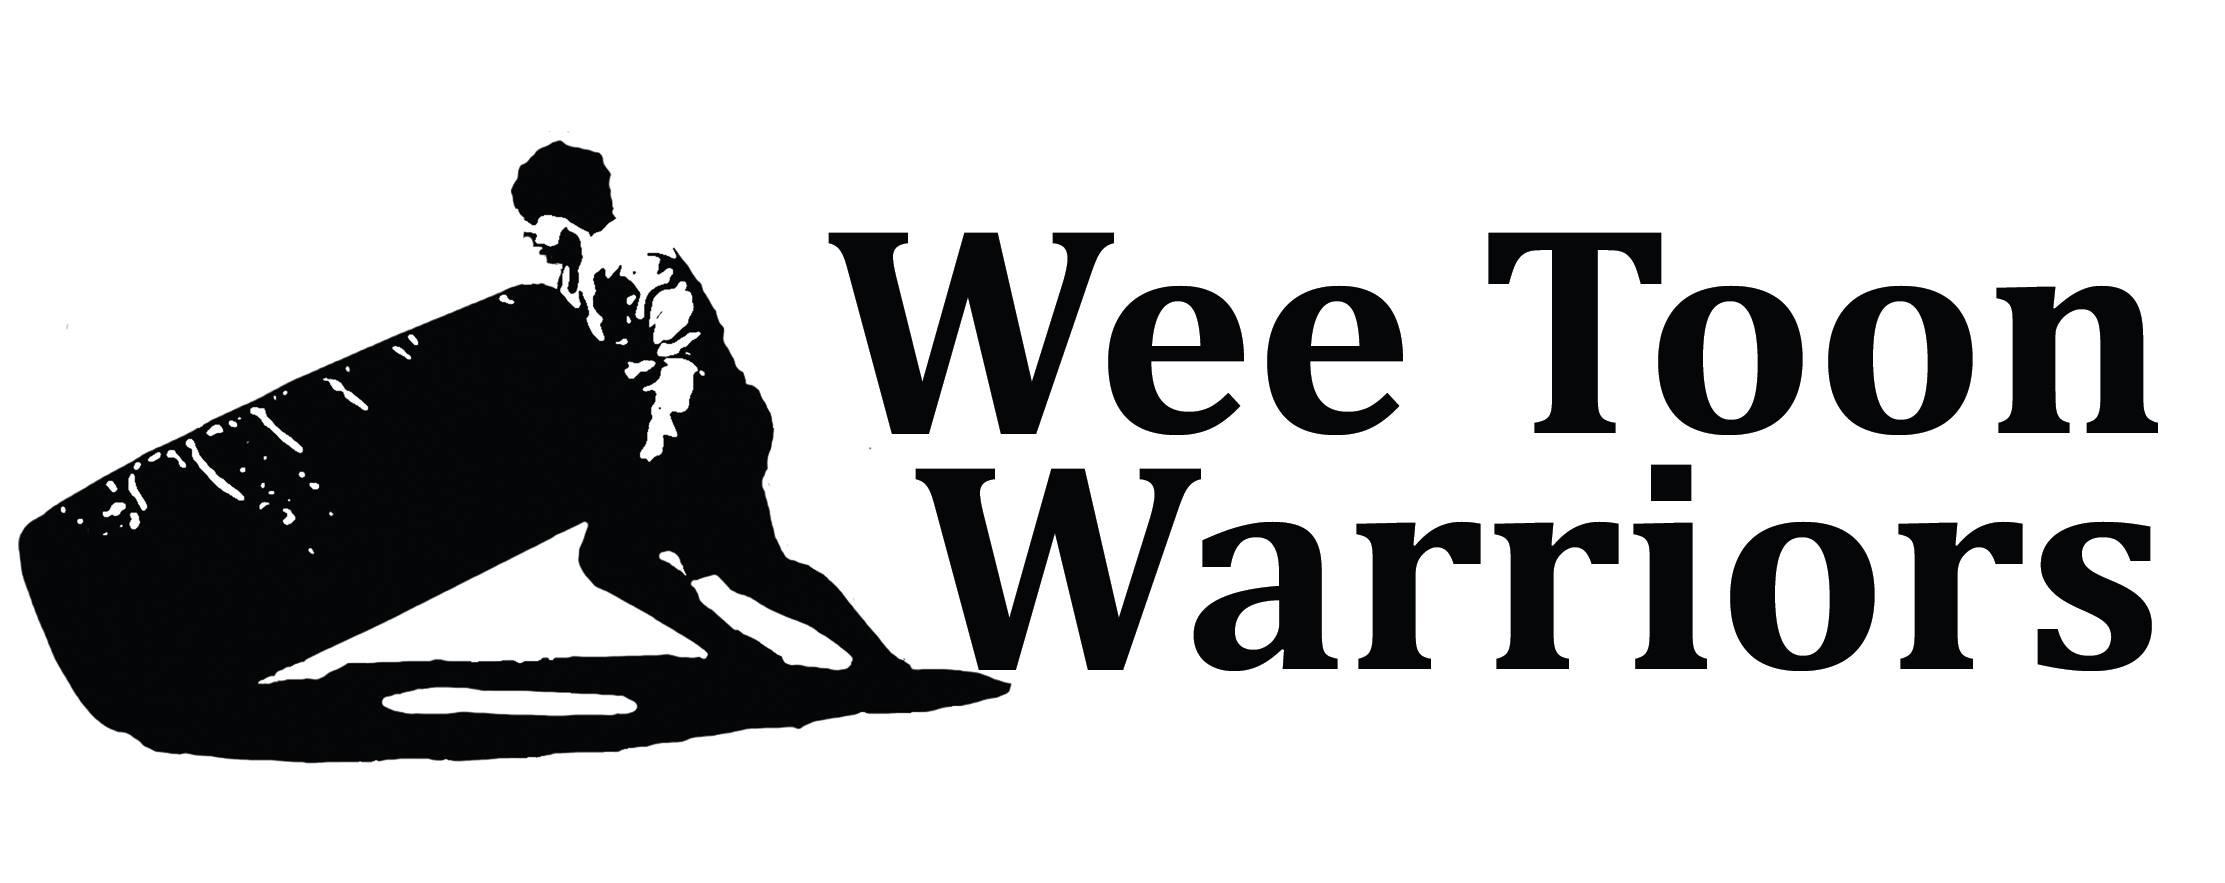 Wee Toon Warriors – Dancing their way through 2018